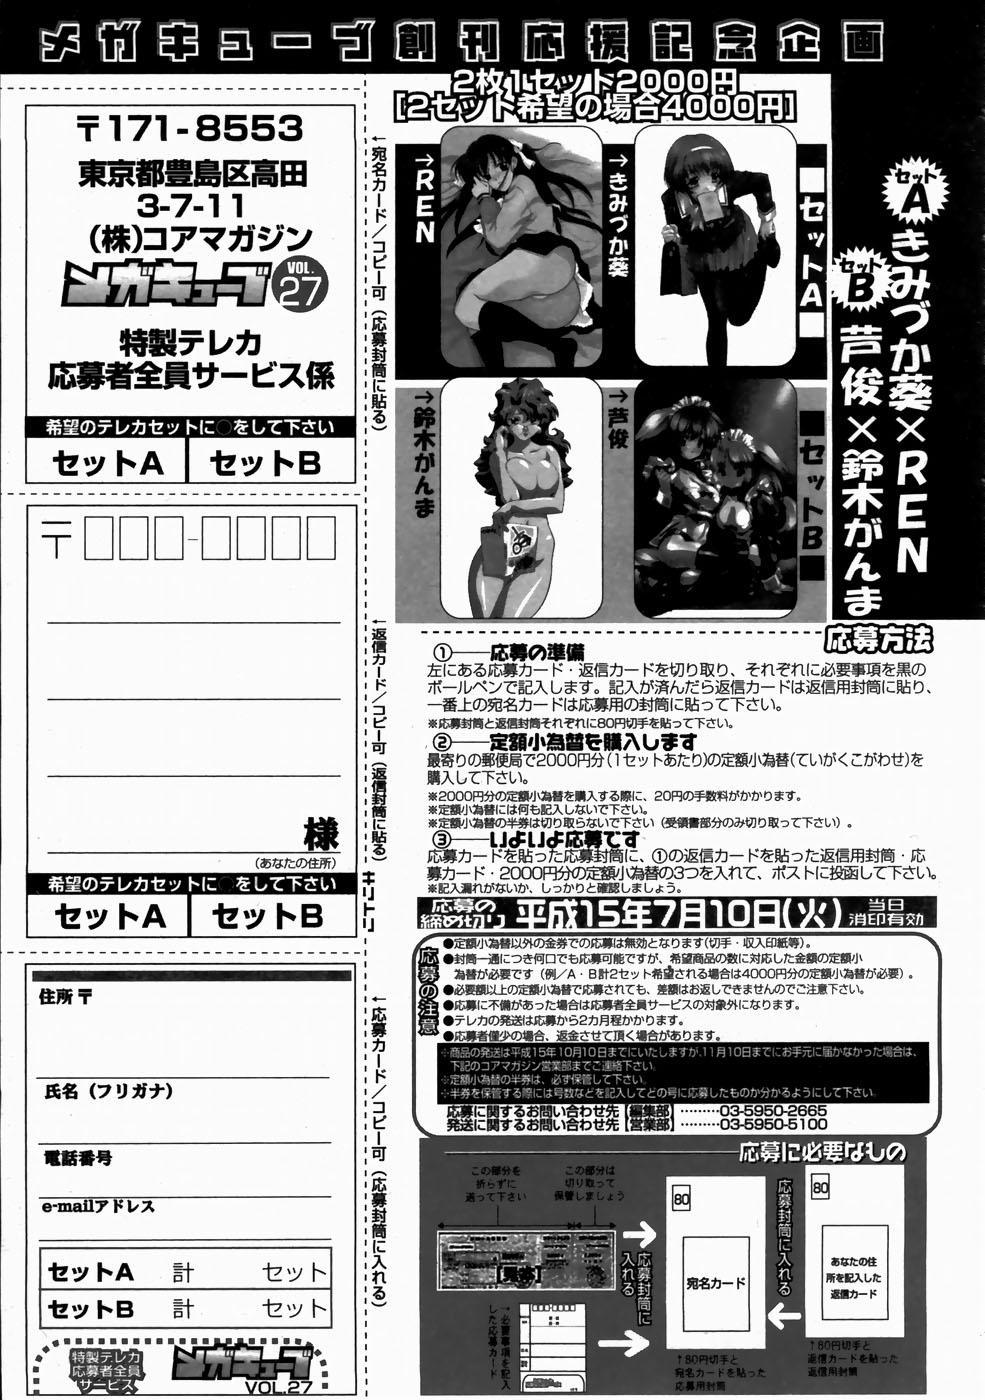 COMIC Megastore H 2003-07 264